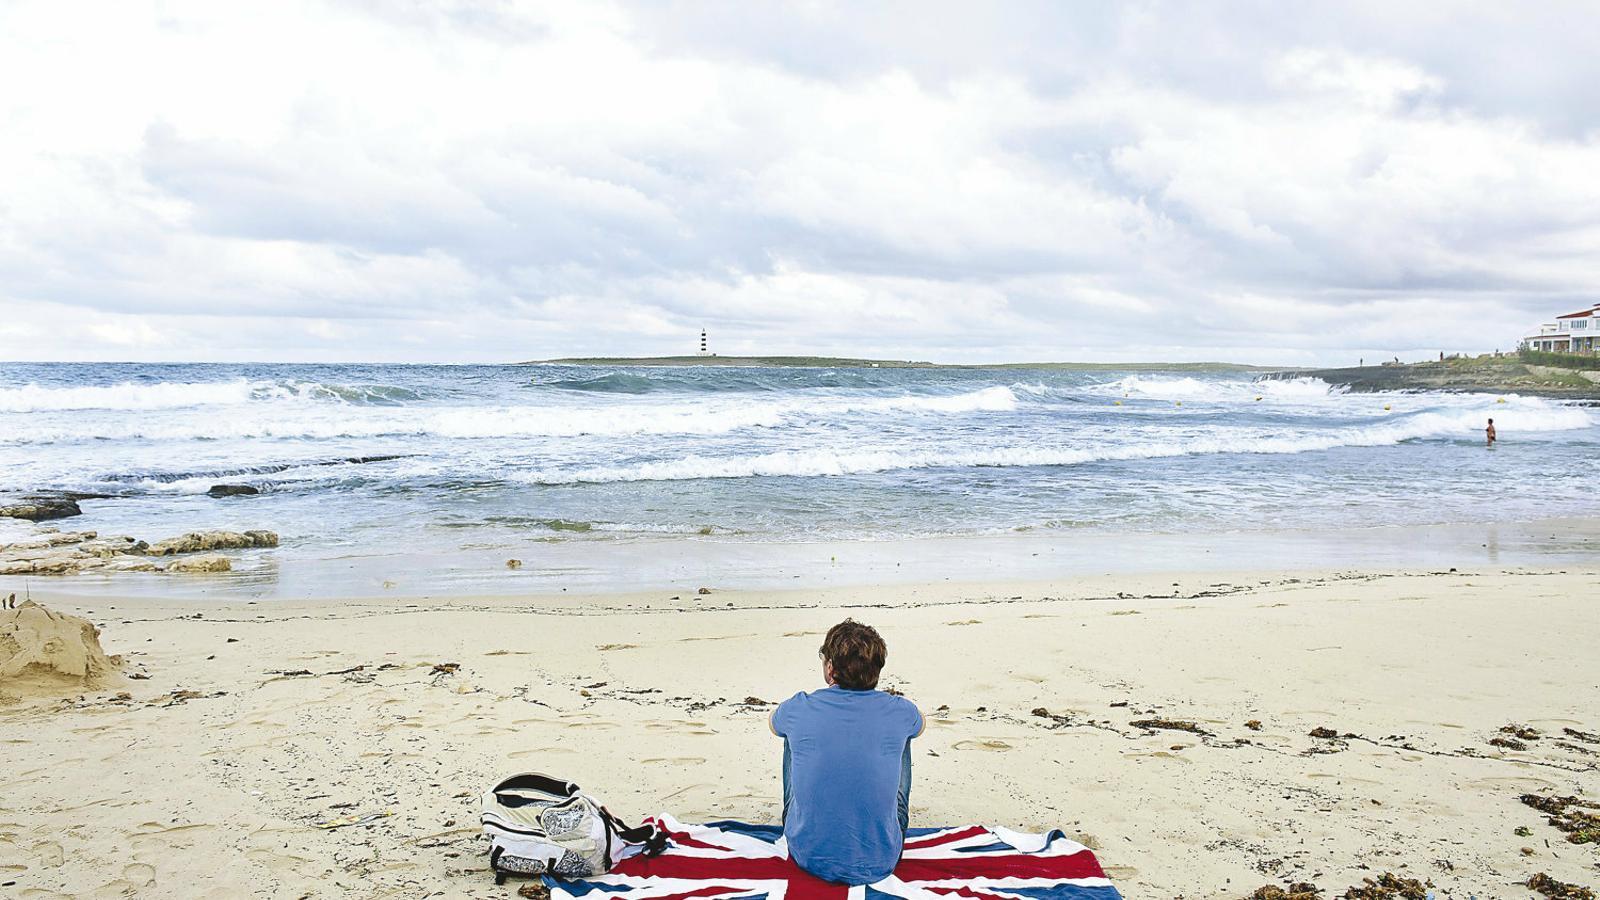 Thomas Cook empeny les Balears cap a un nou model turístic